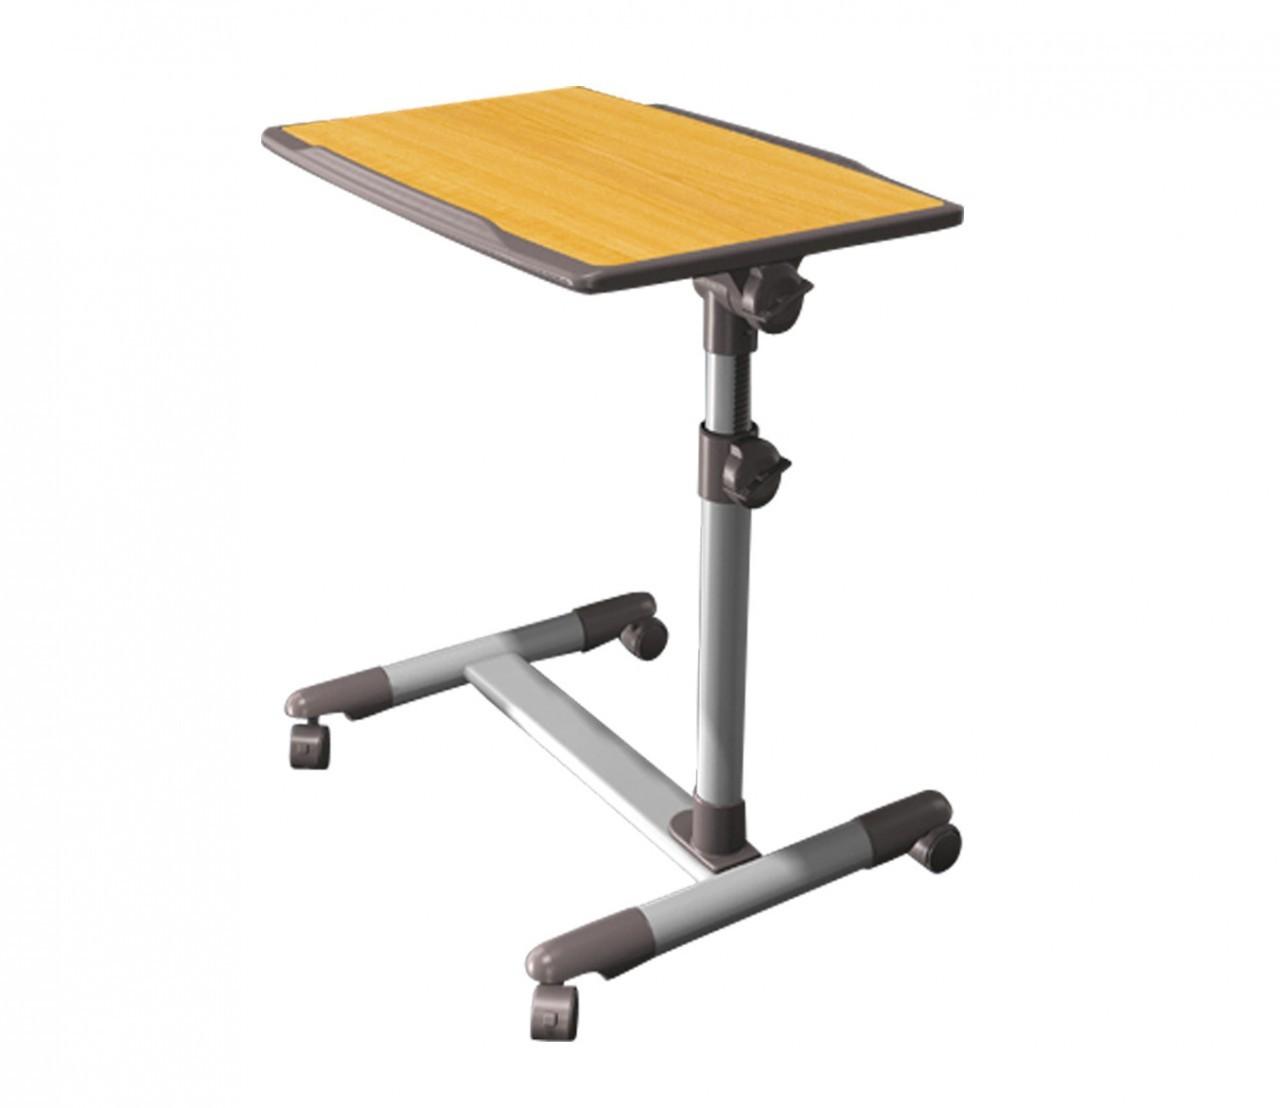 adjustable height coffee table plans